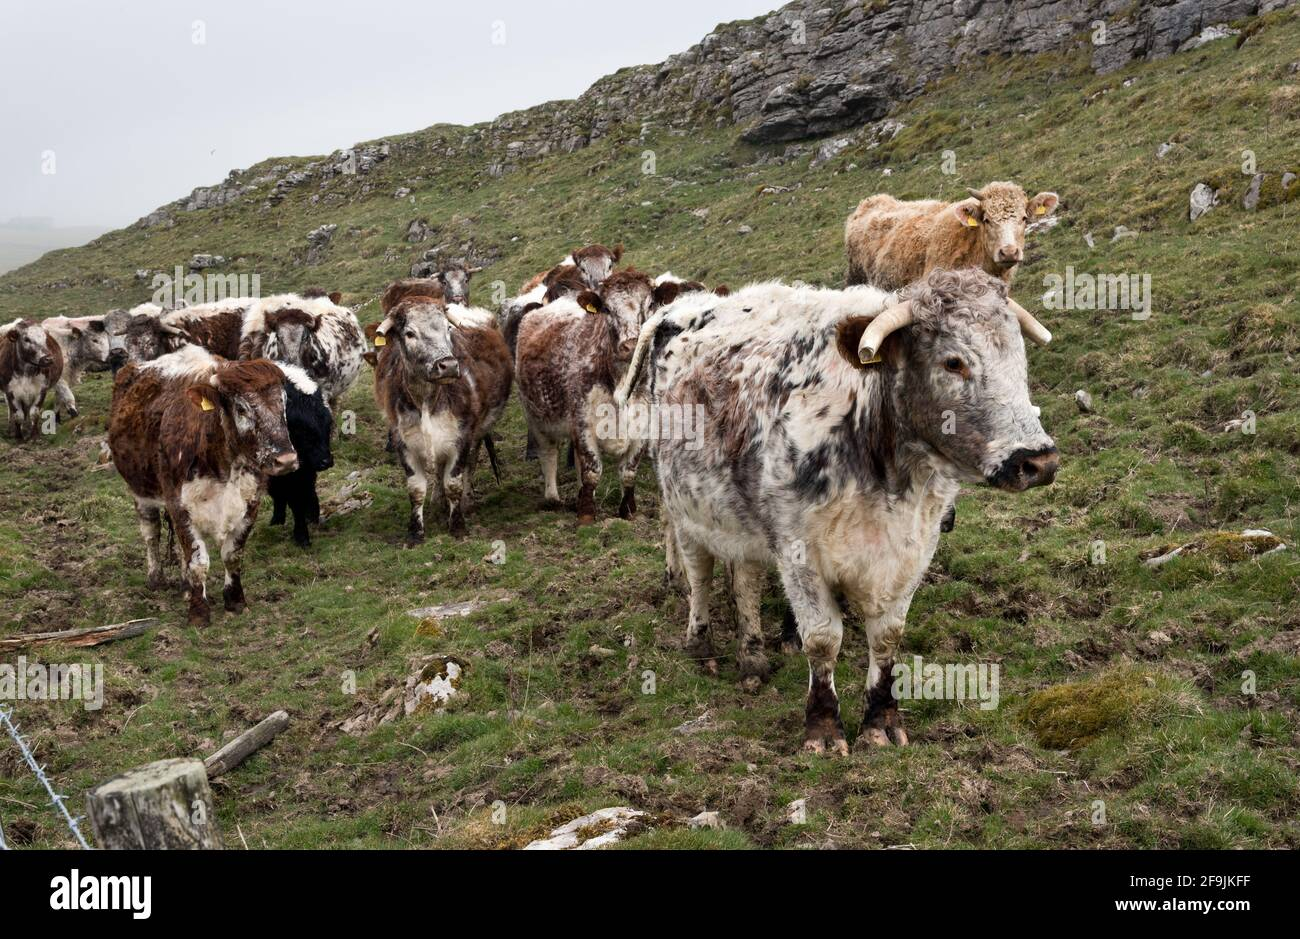 Ganado de Longhorn que pastan cerca de Malham, Yorkshire Dales National Park, Reino Unido Foto de stock